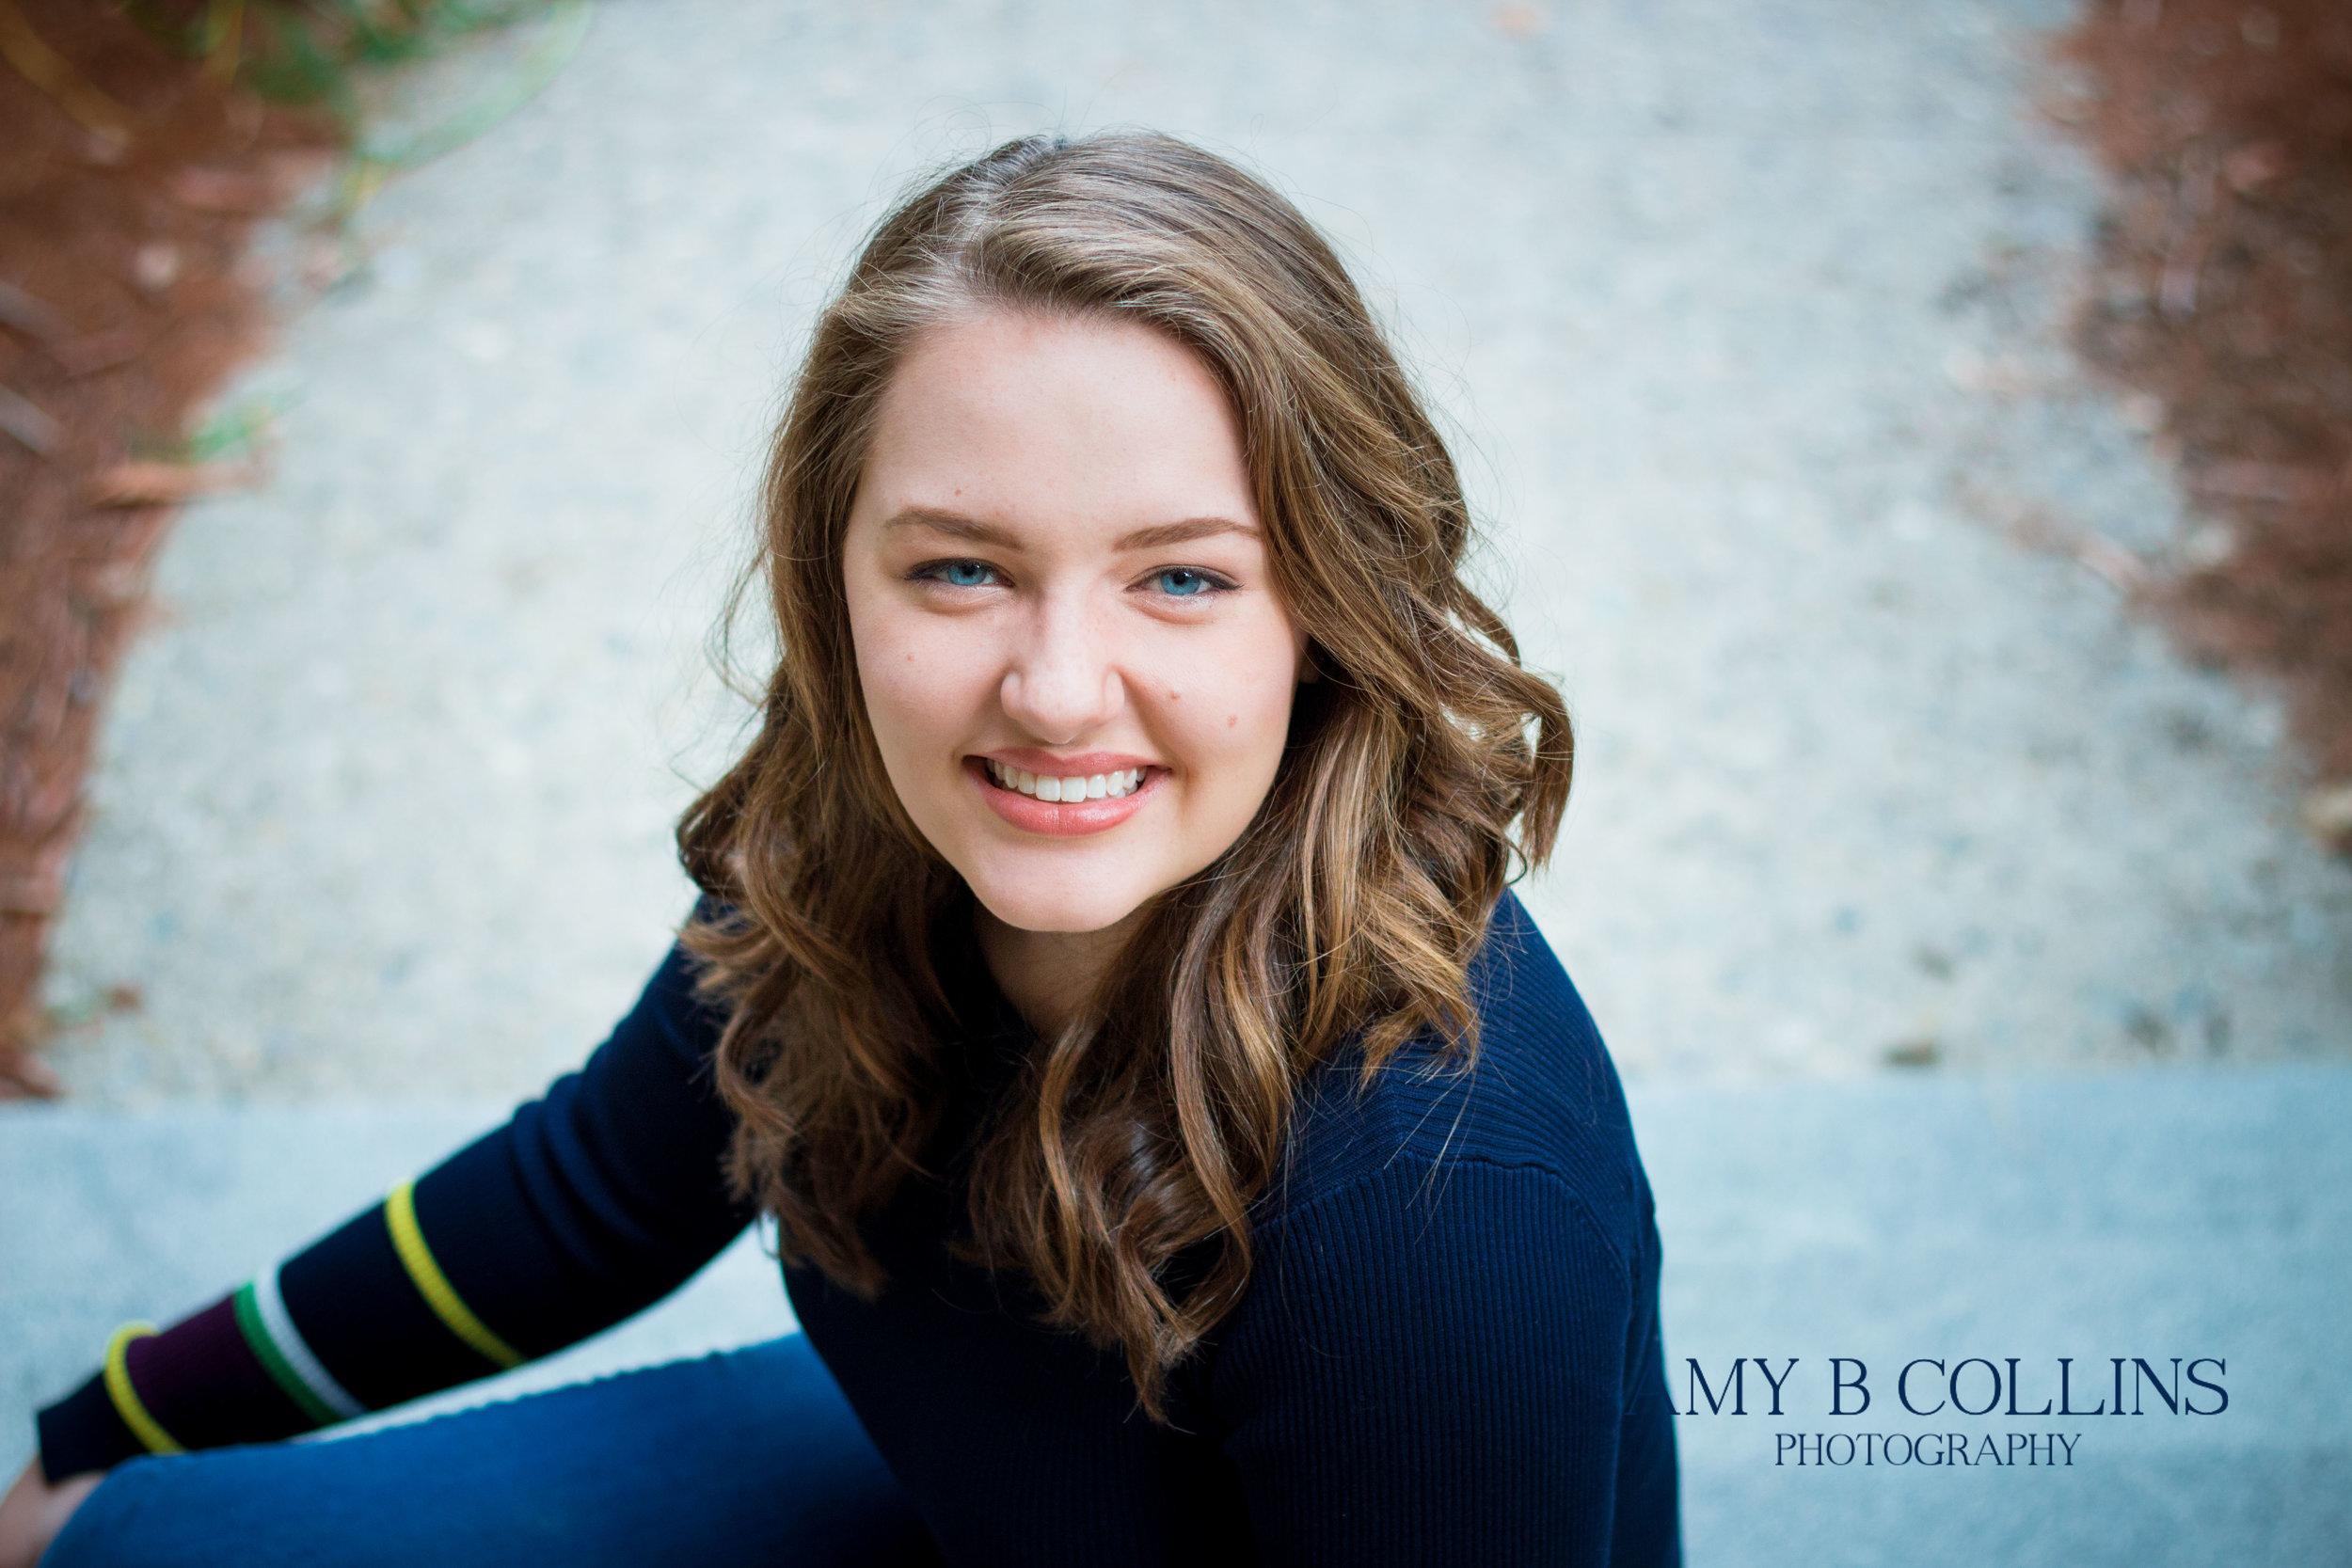 AmyBCollinsPhotography_SeniorSession_Sasha-3.jpg